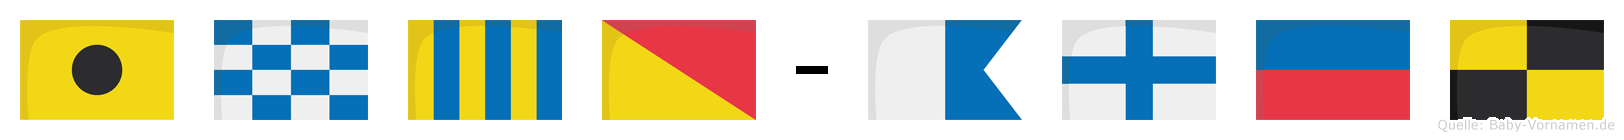 Ingo-Axel im Flaggenalphabet